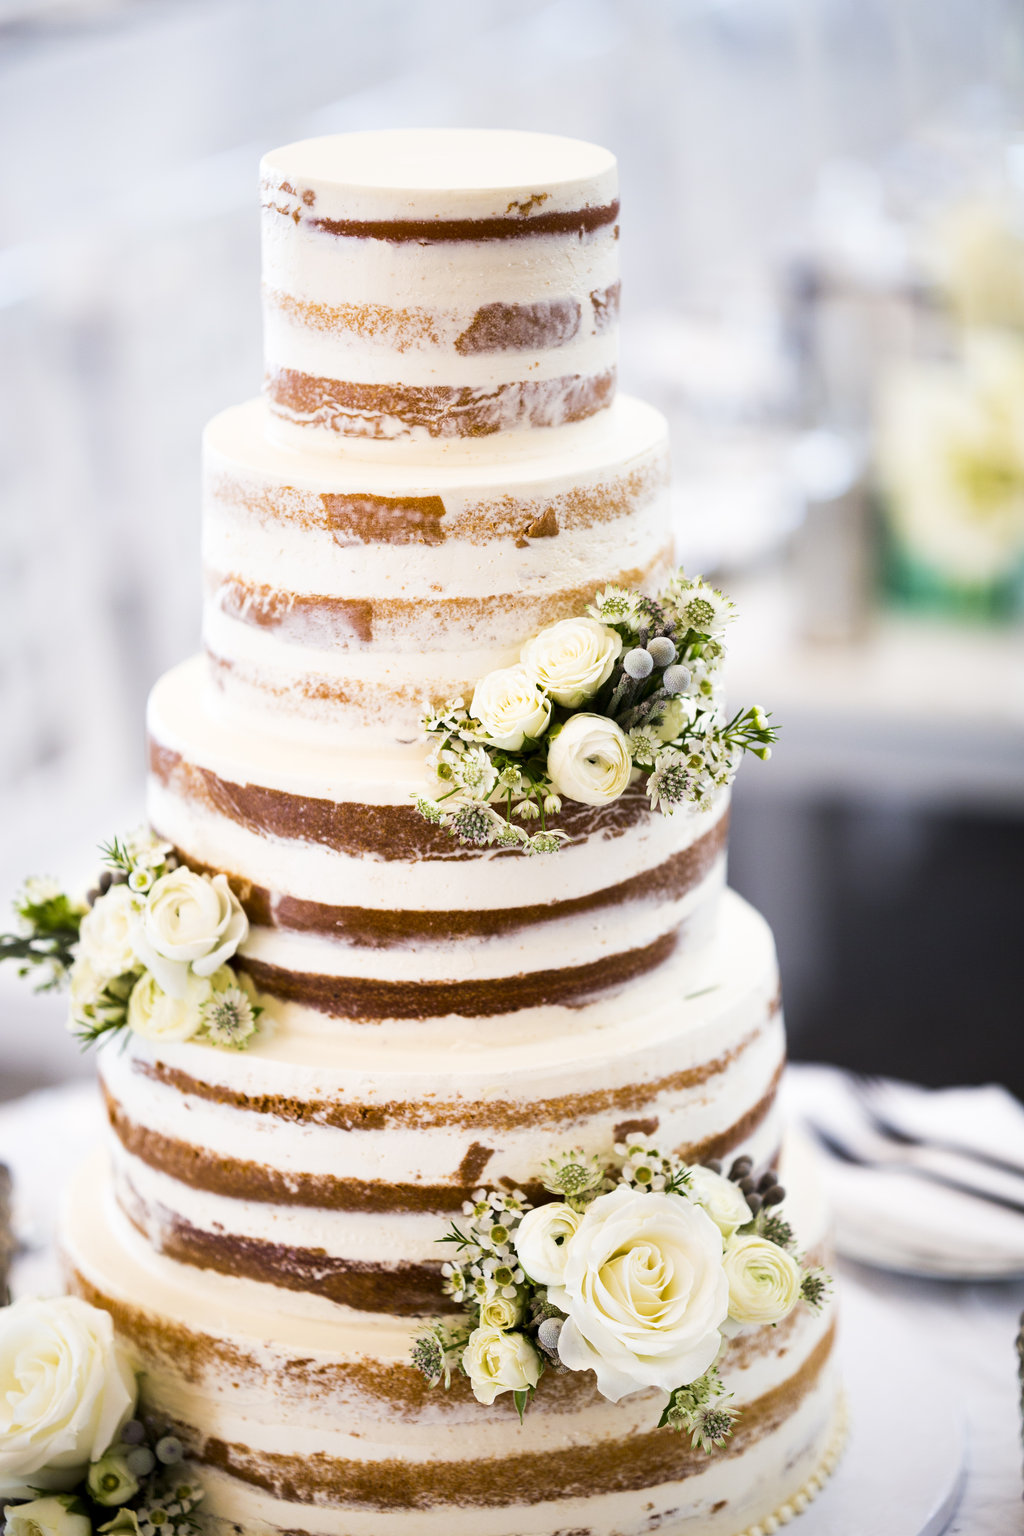 naked wedding cake with fresh ivory white flowers and greenery